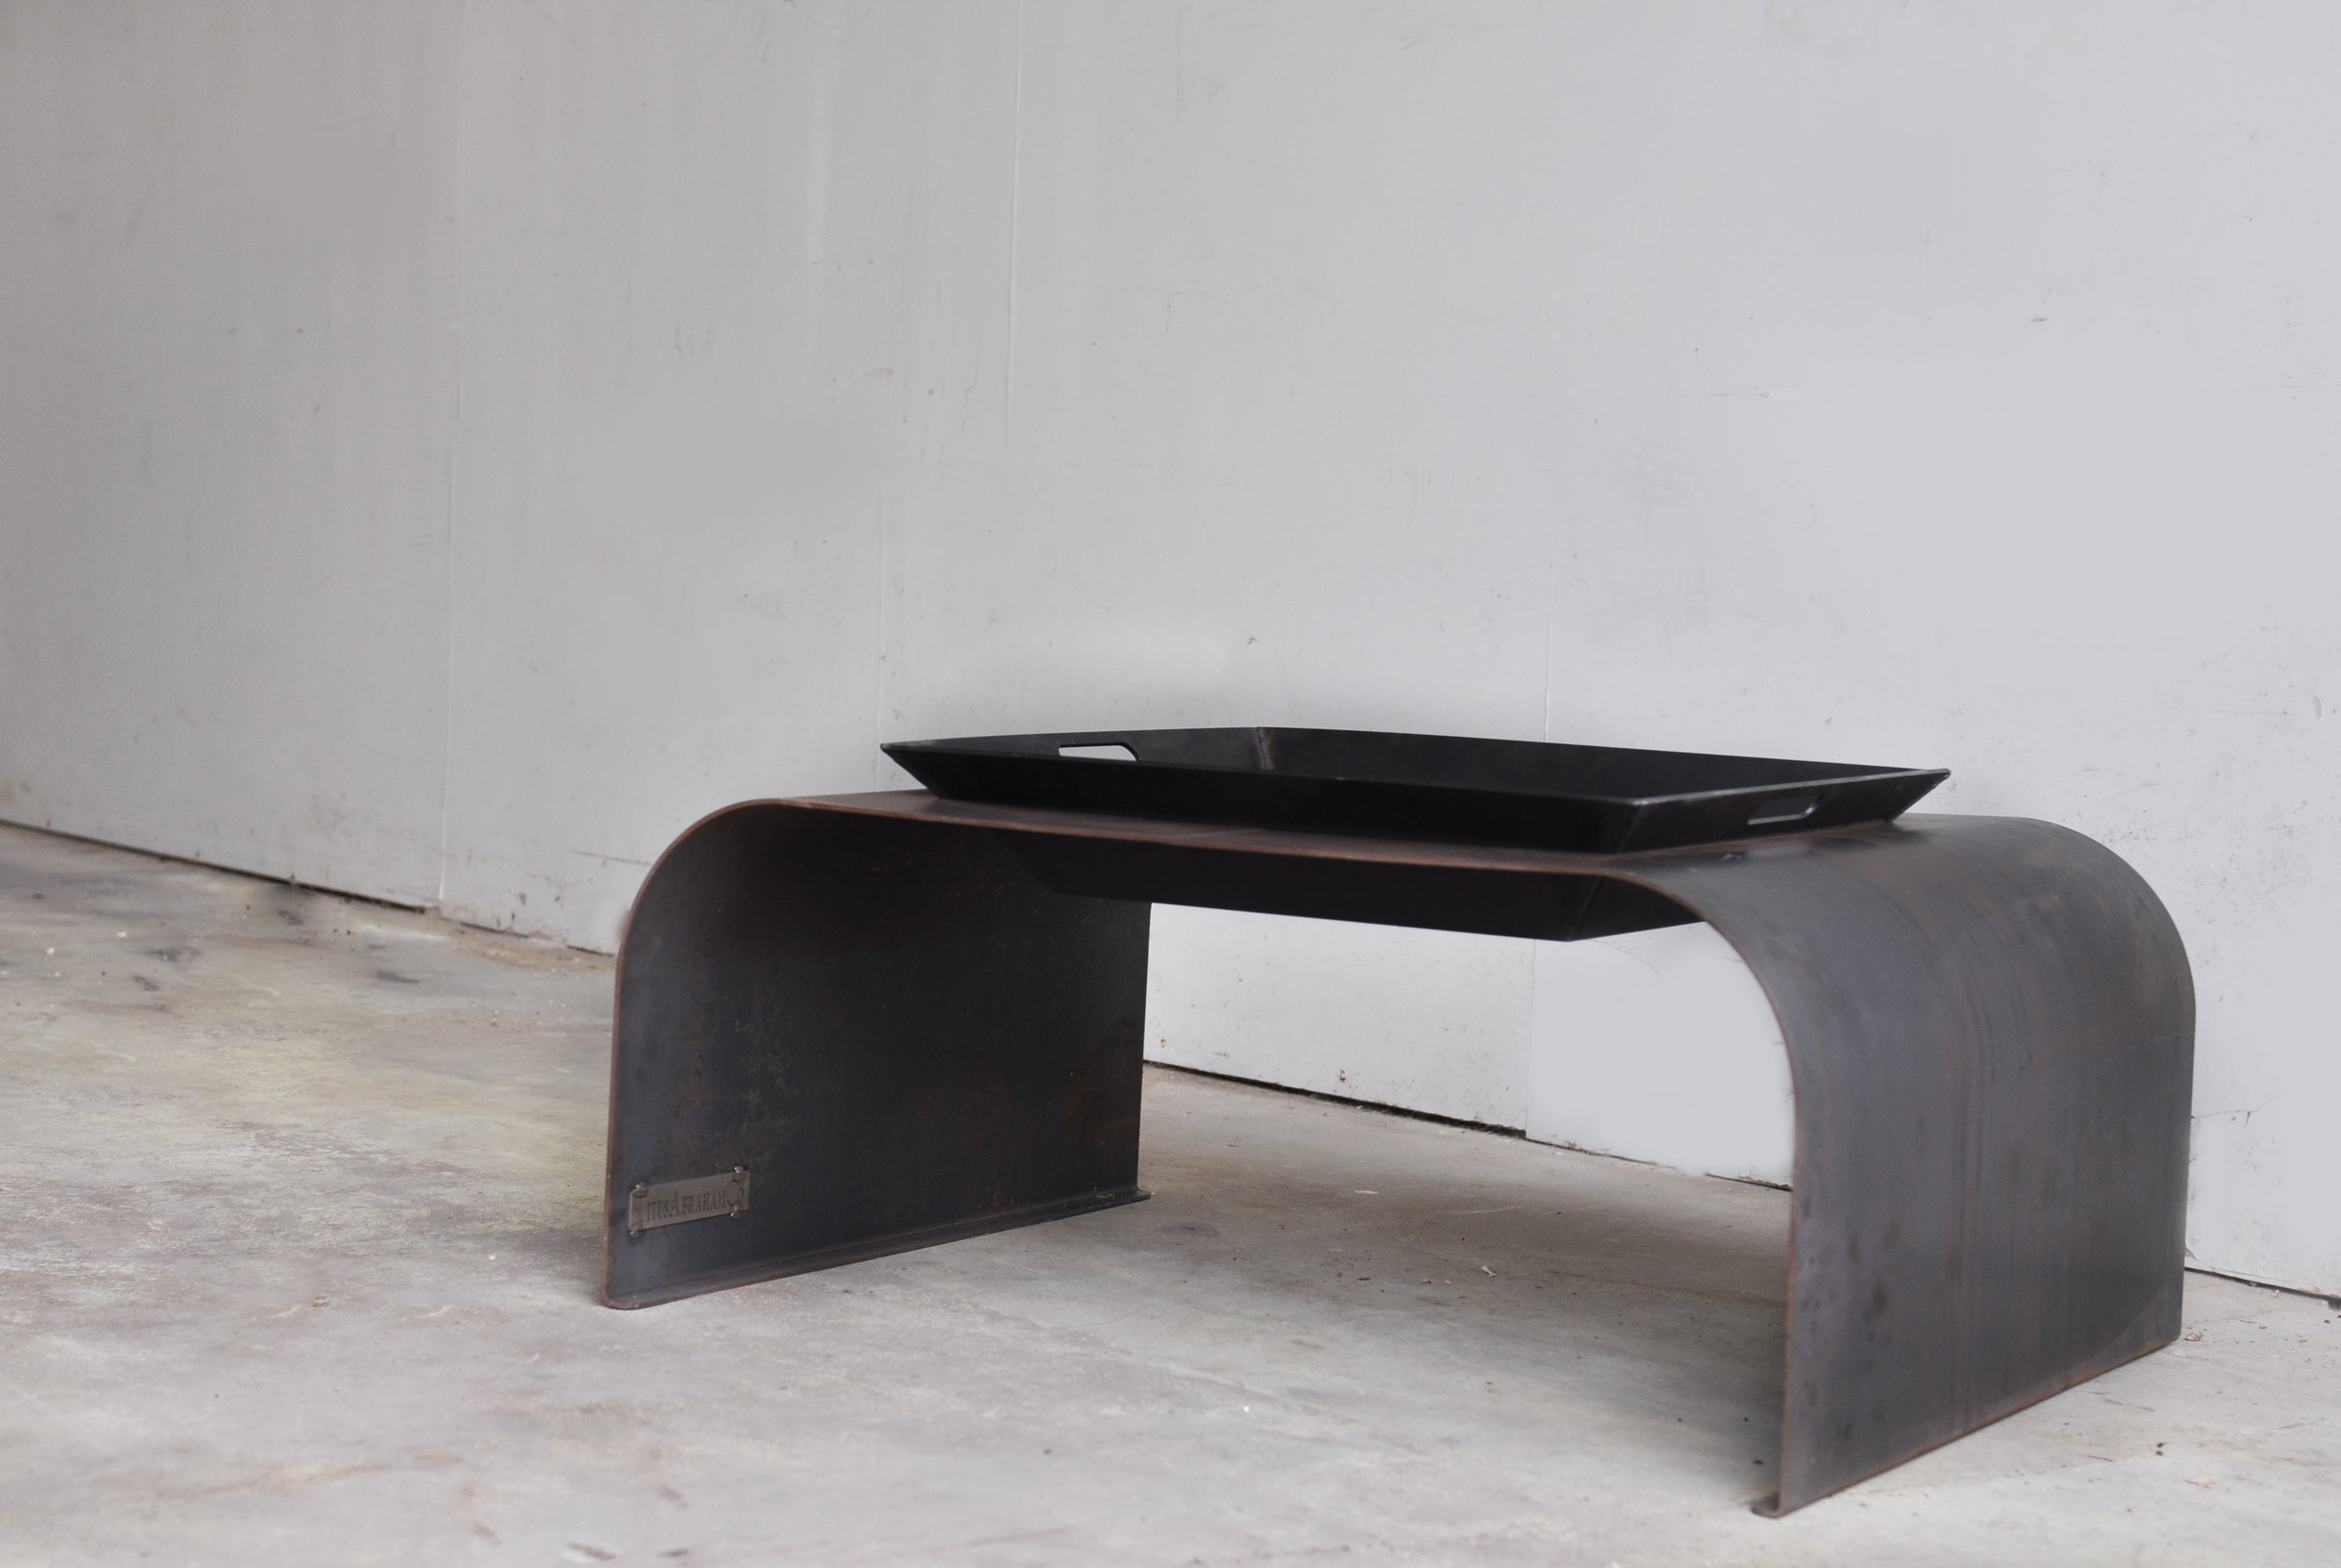 bespoke furniture, minimalist fire pit